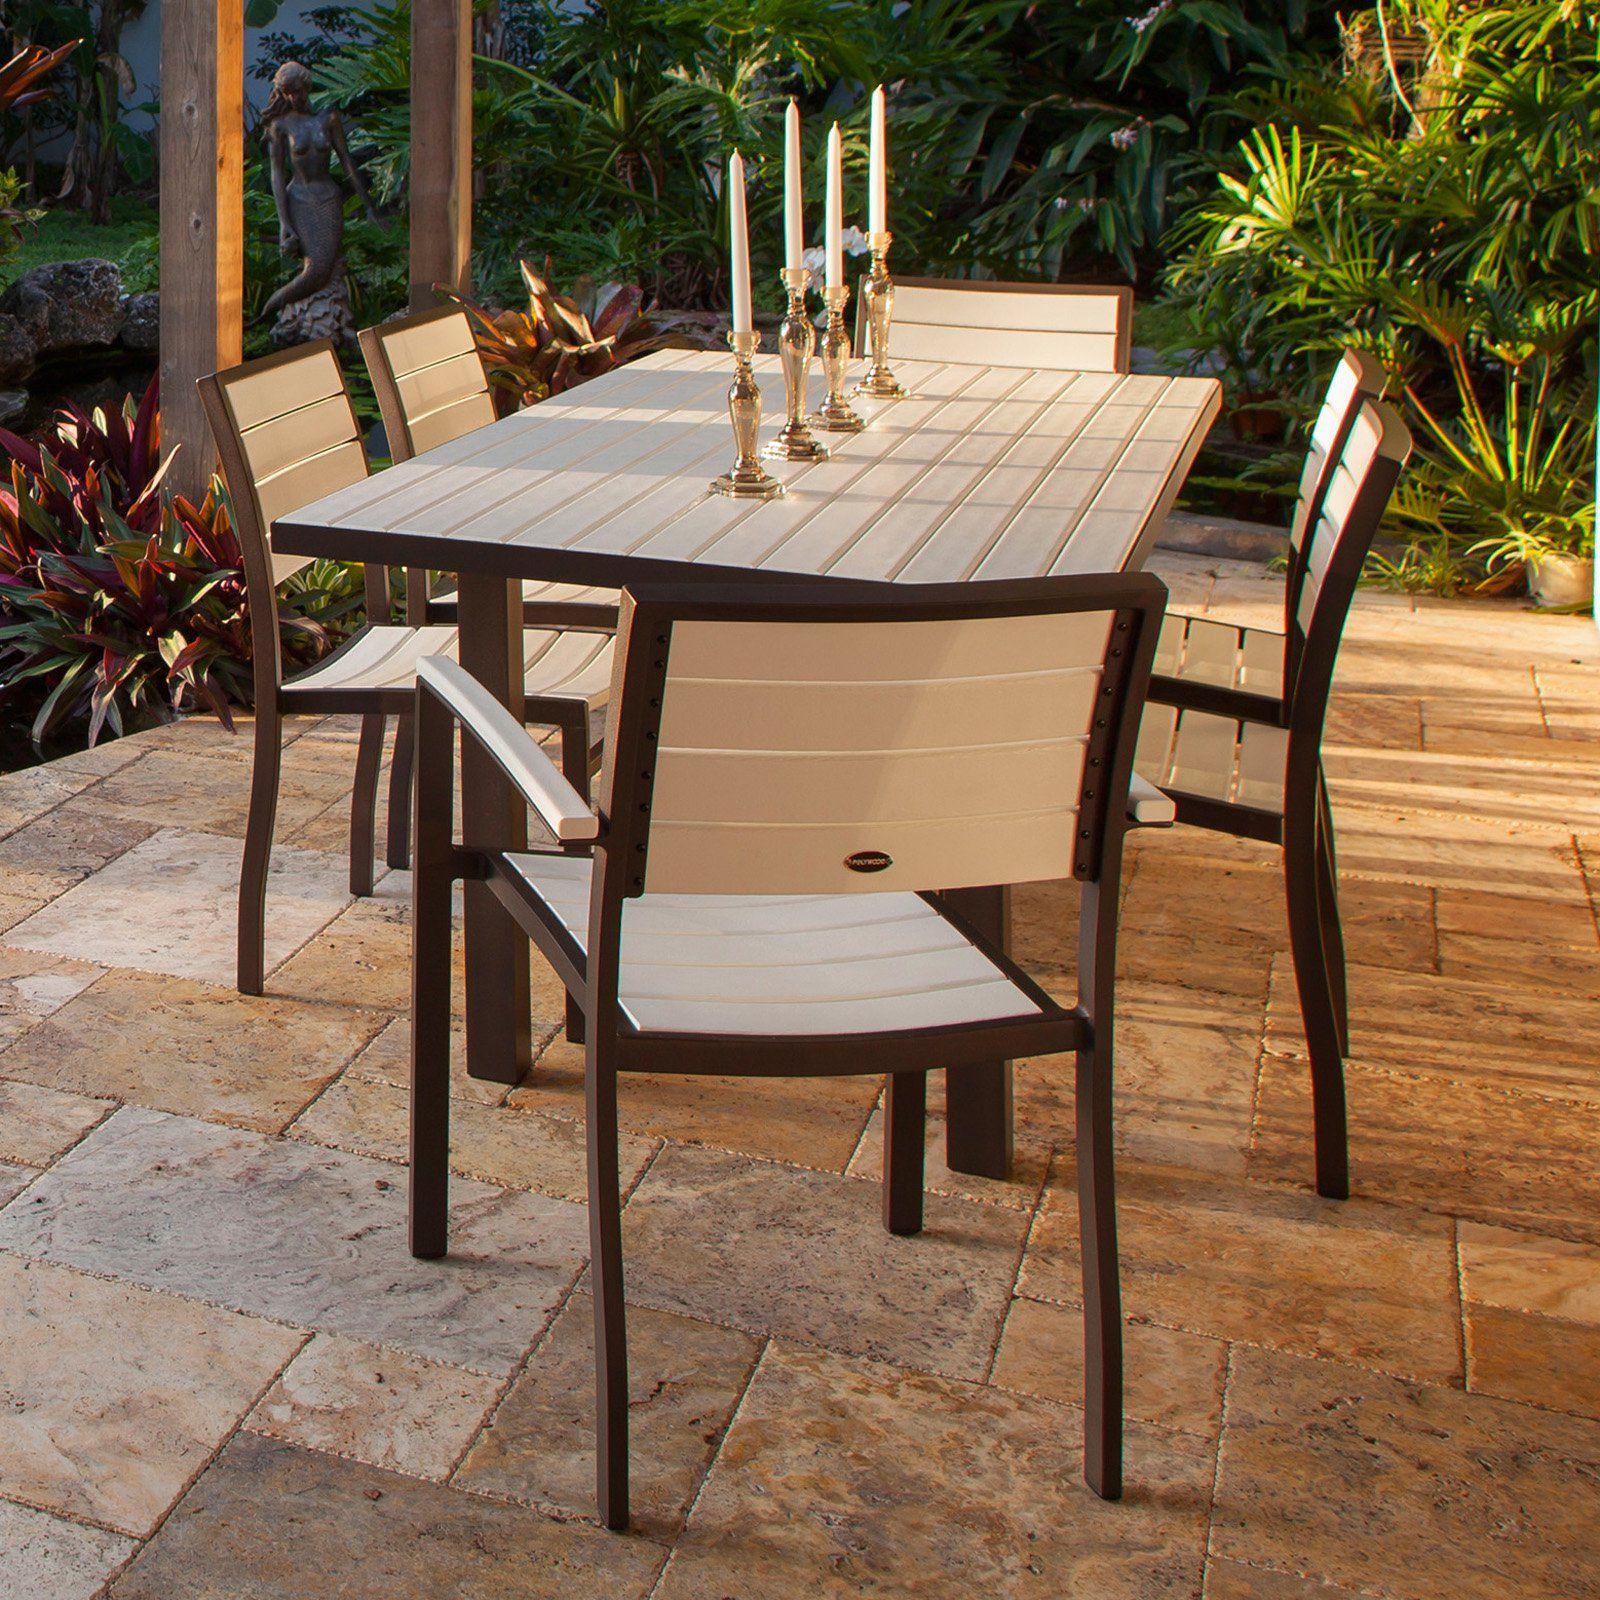 Polywood Euro Dining Set With Aluminum Frame Seats 6 Patio